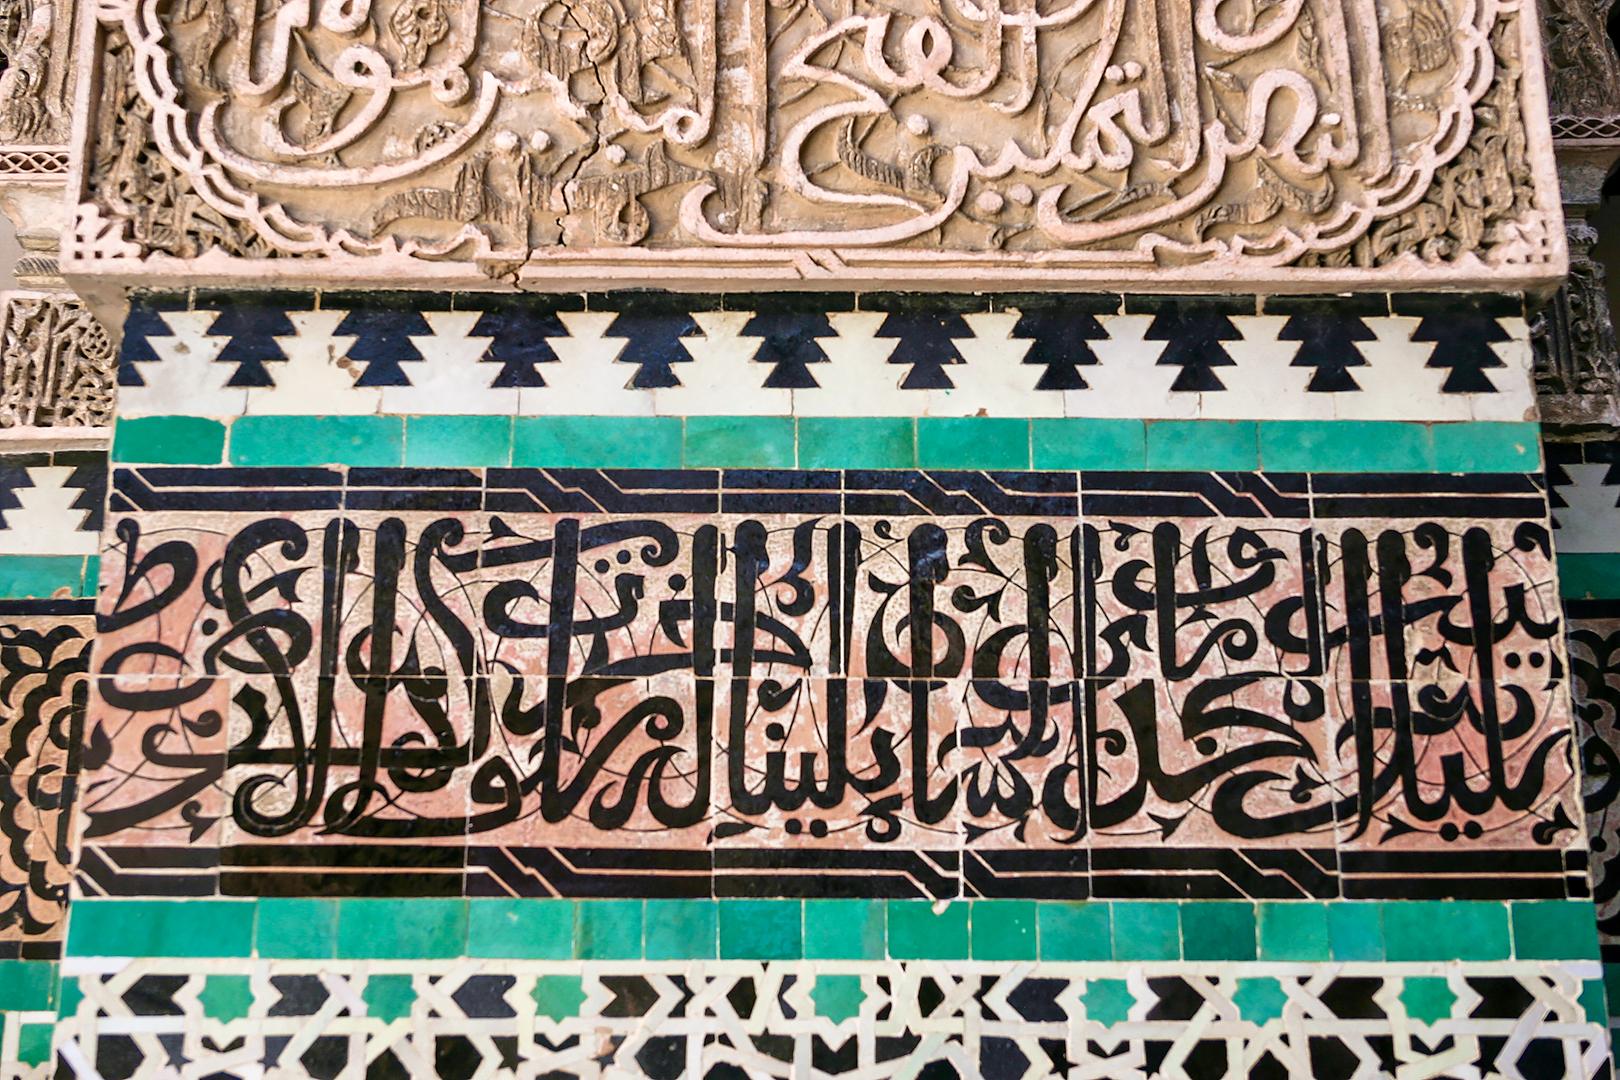 Tilework at Bou Inania Madrasa